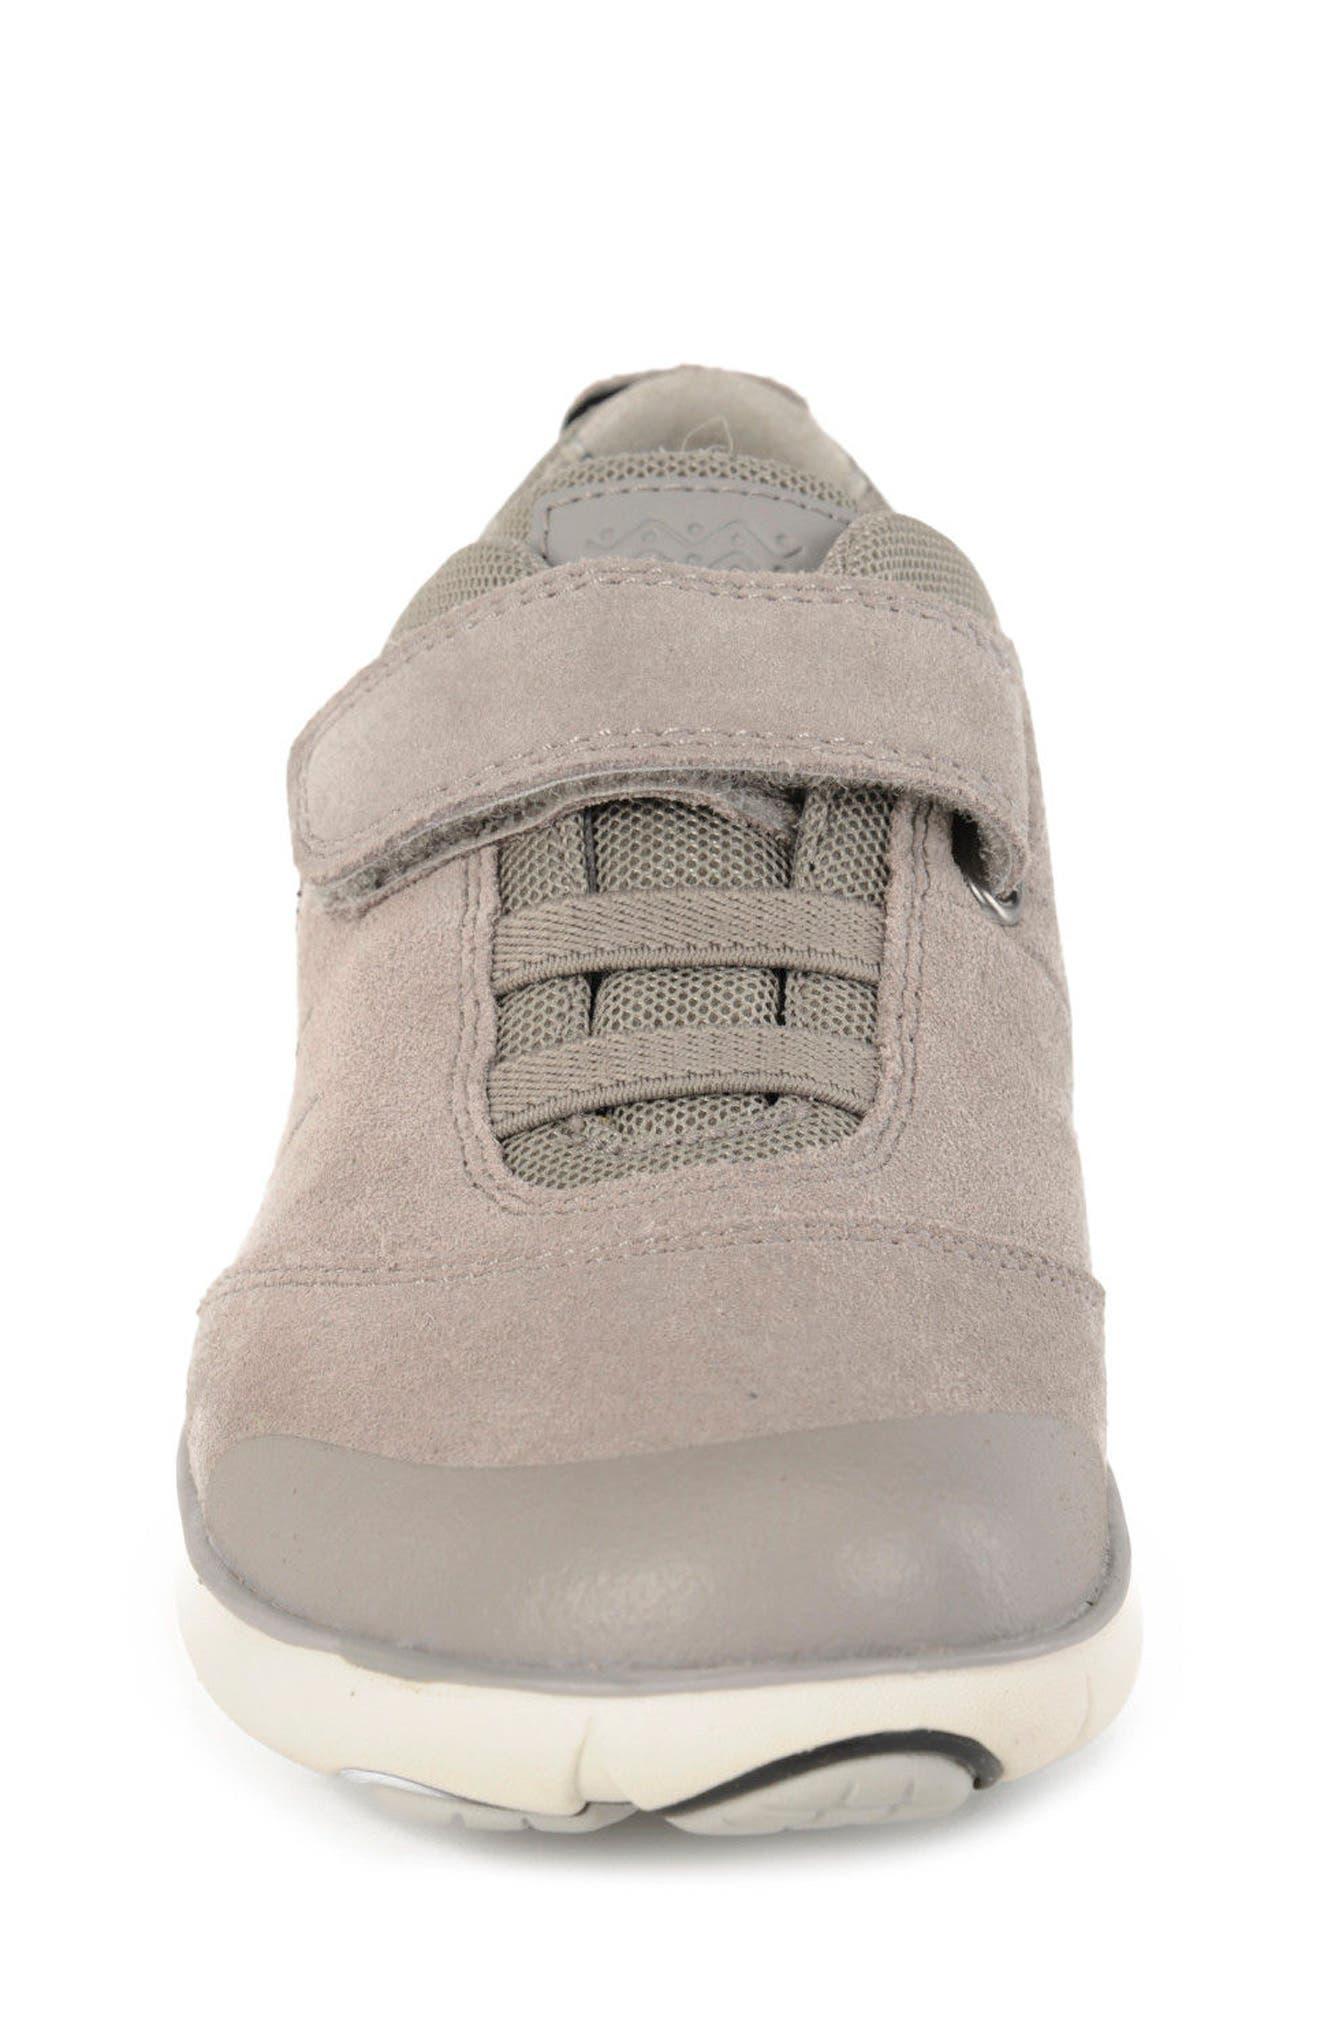 Nebula Low Top Sneaker,                             Alternate thumbnail 4, color,                             Grey